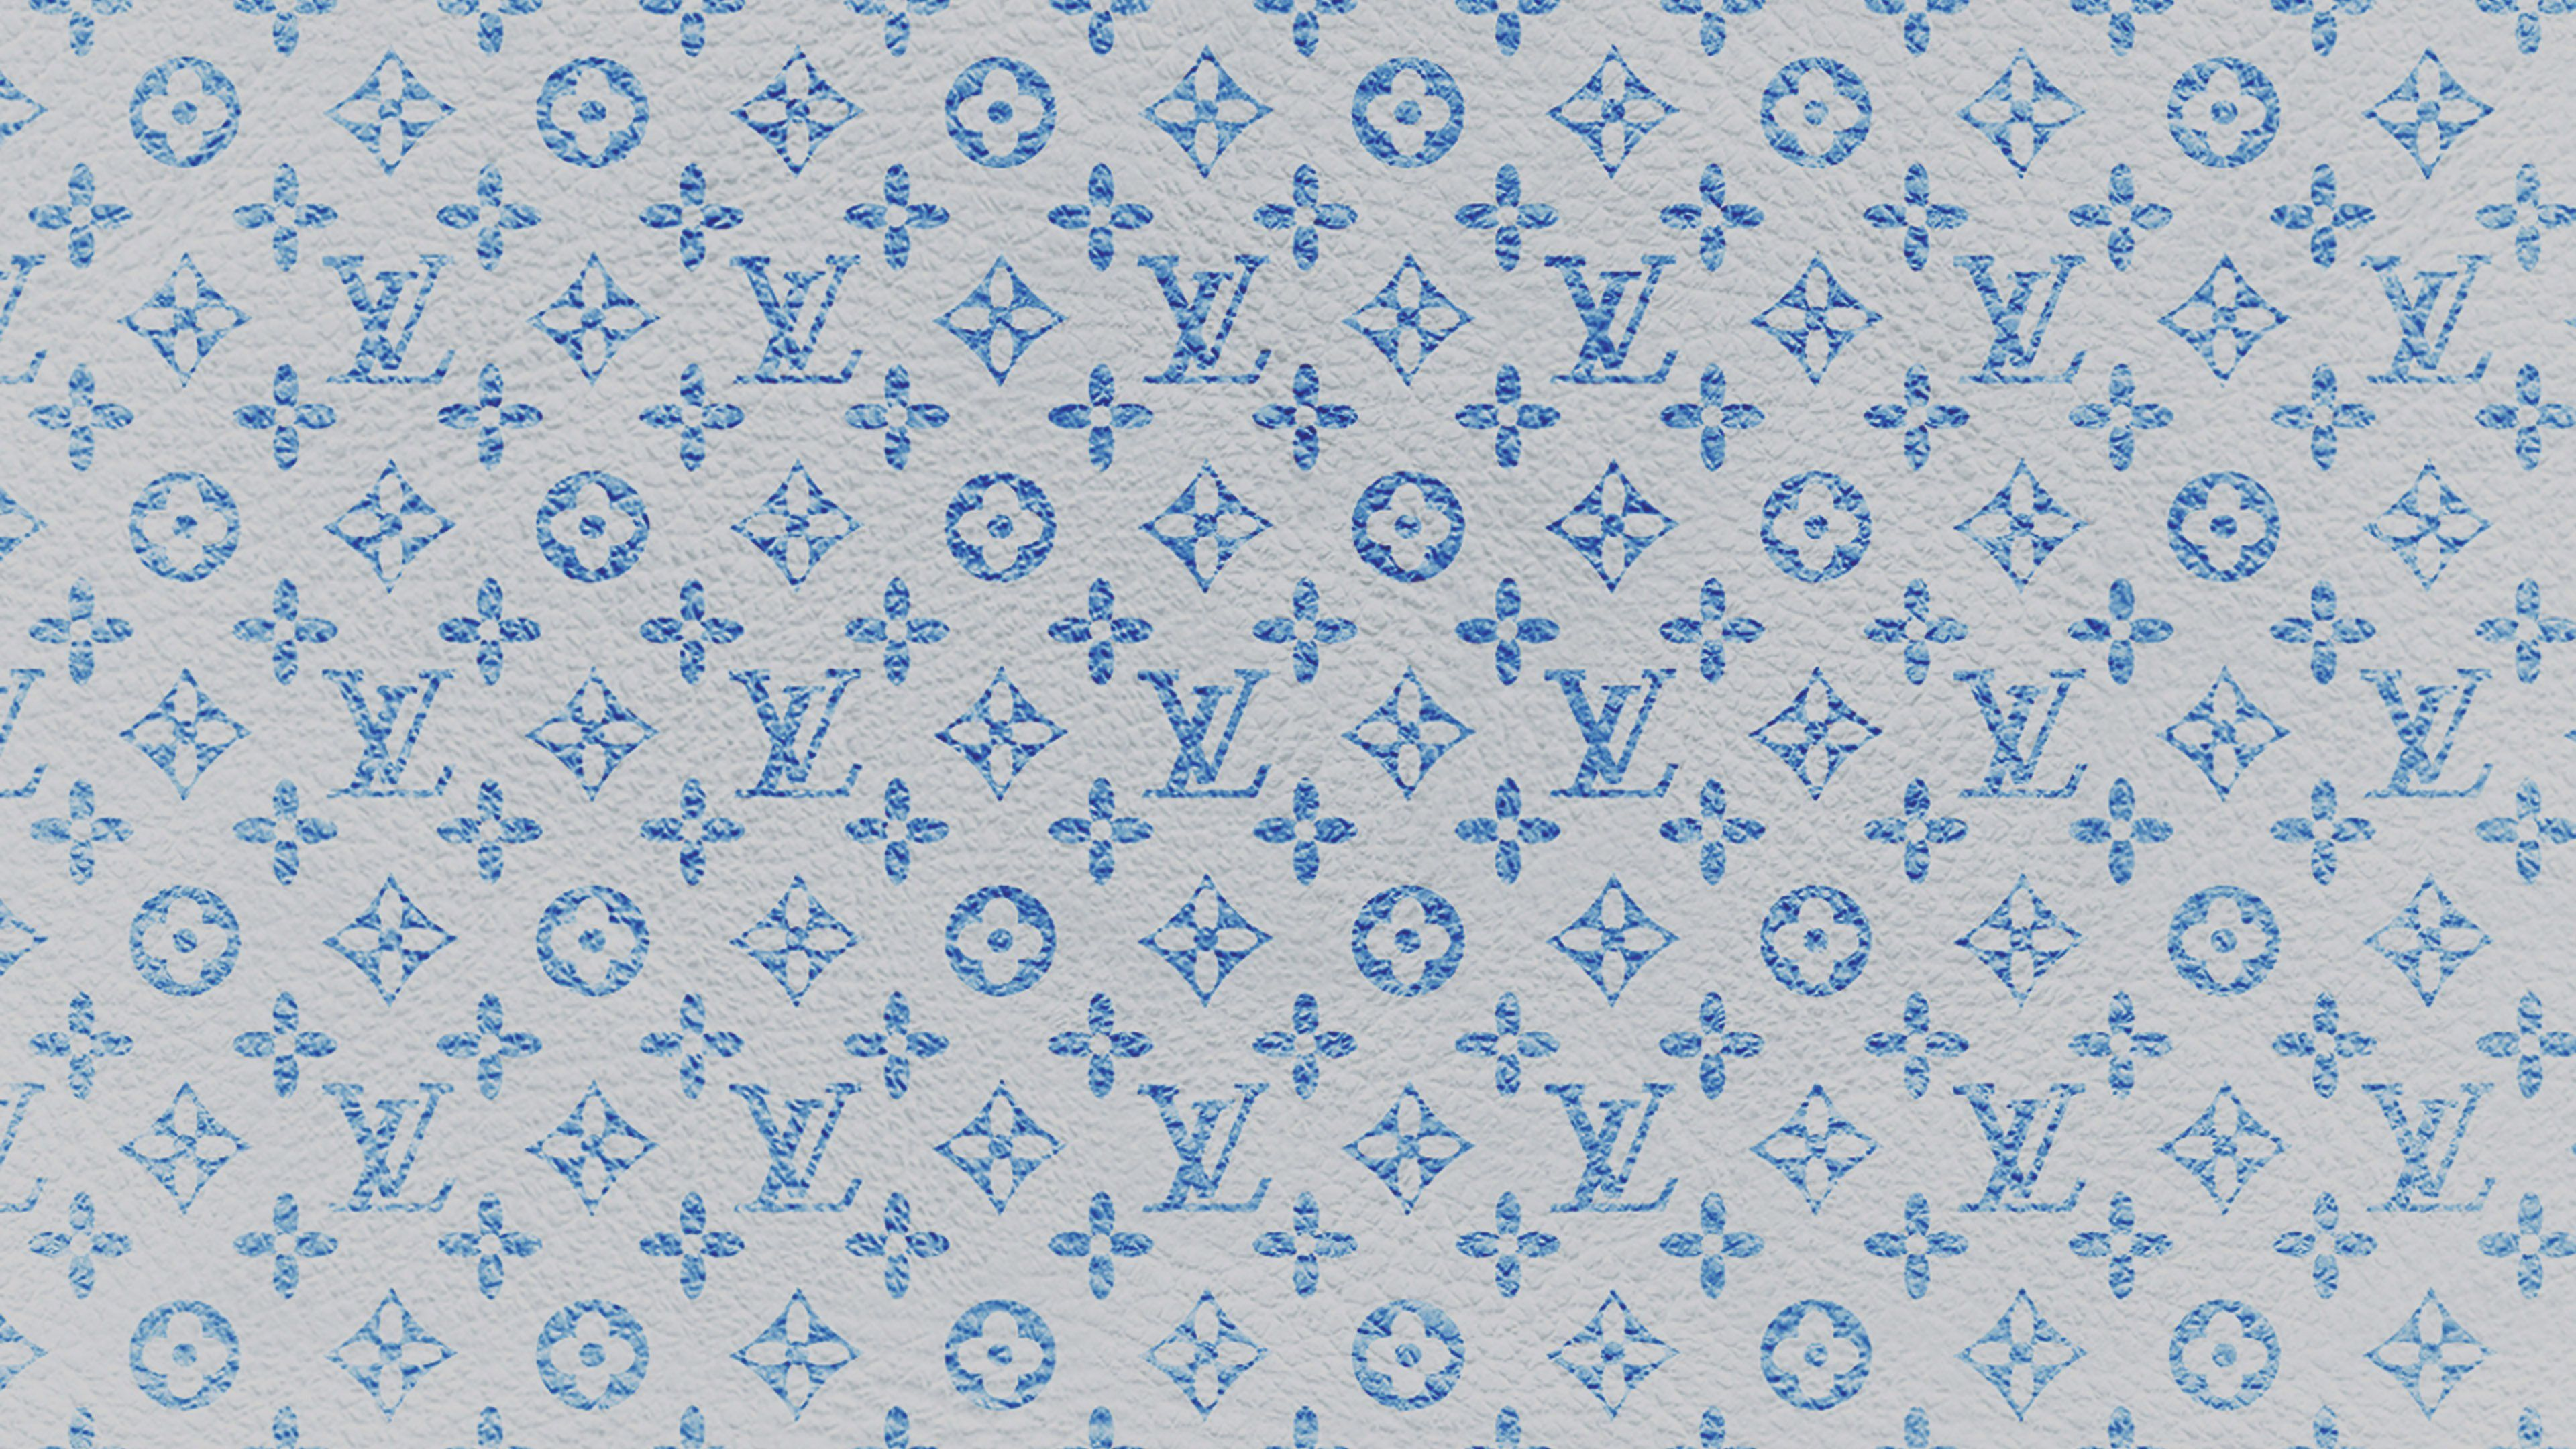 Louis Vuitton Laptop Wallpapers Top Free Louis Vuitton Laptop